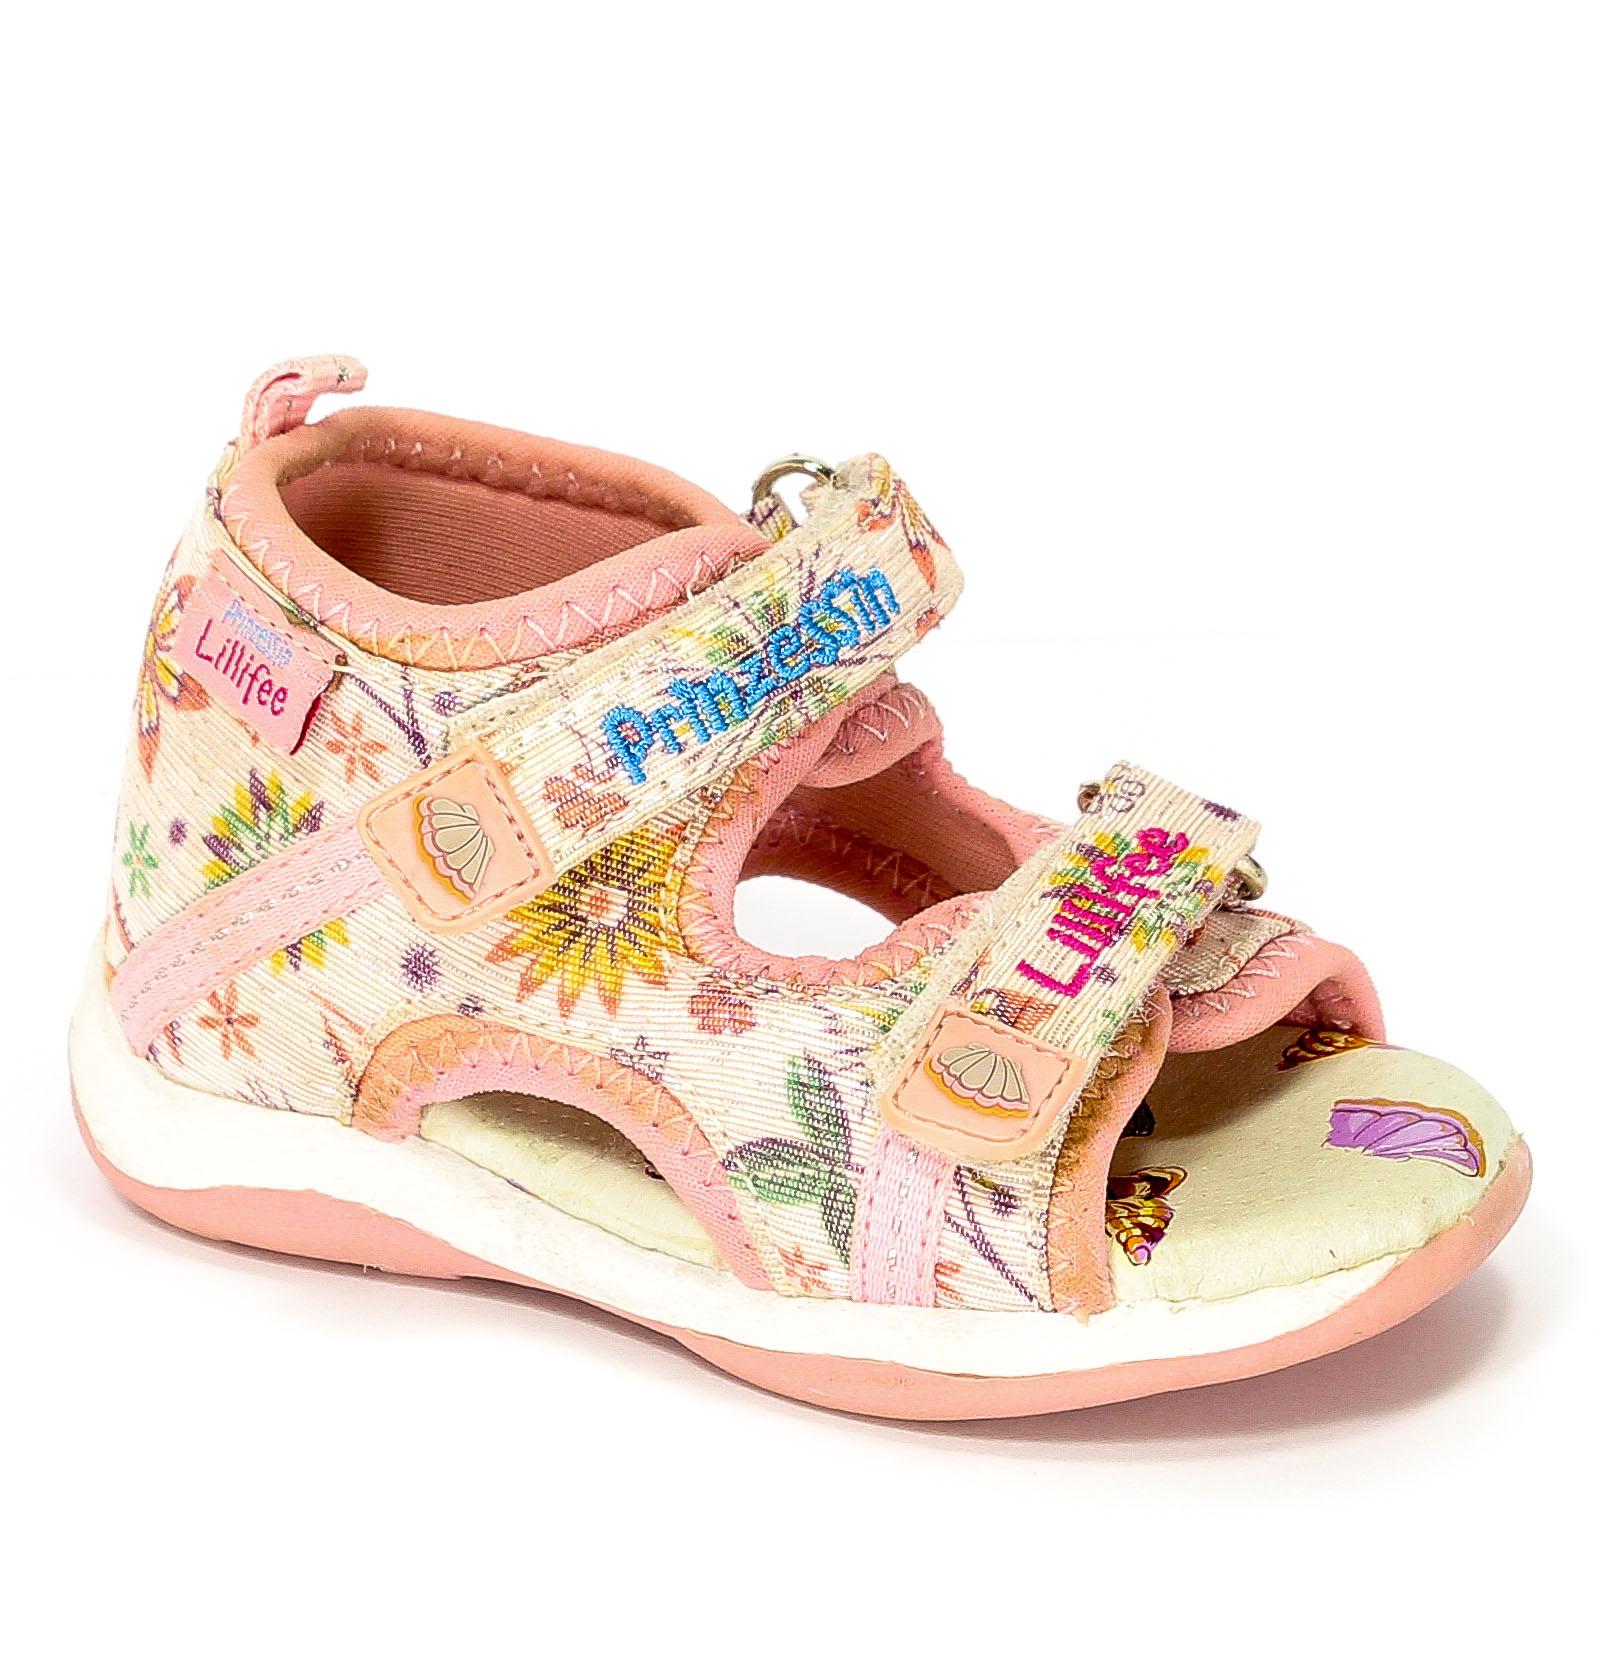 Sandały Lillifee 400050 Rosa Prz.